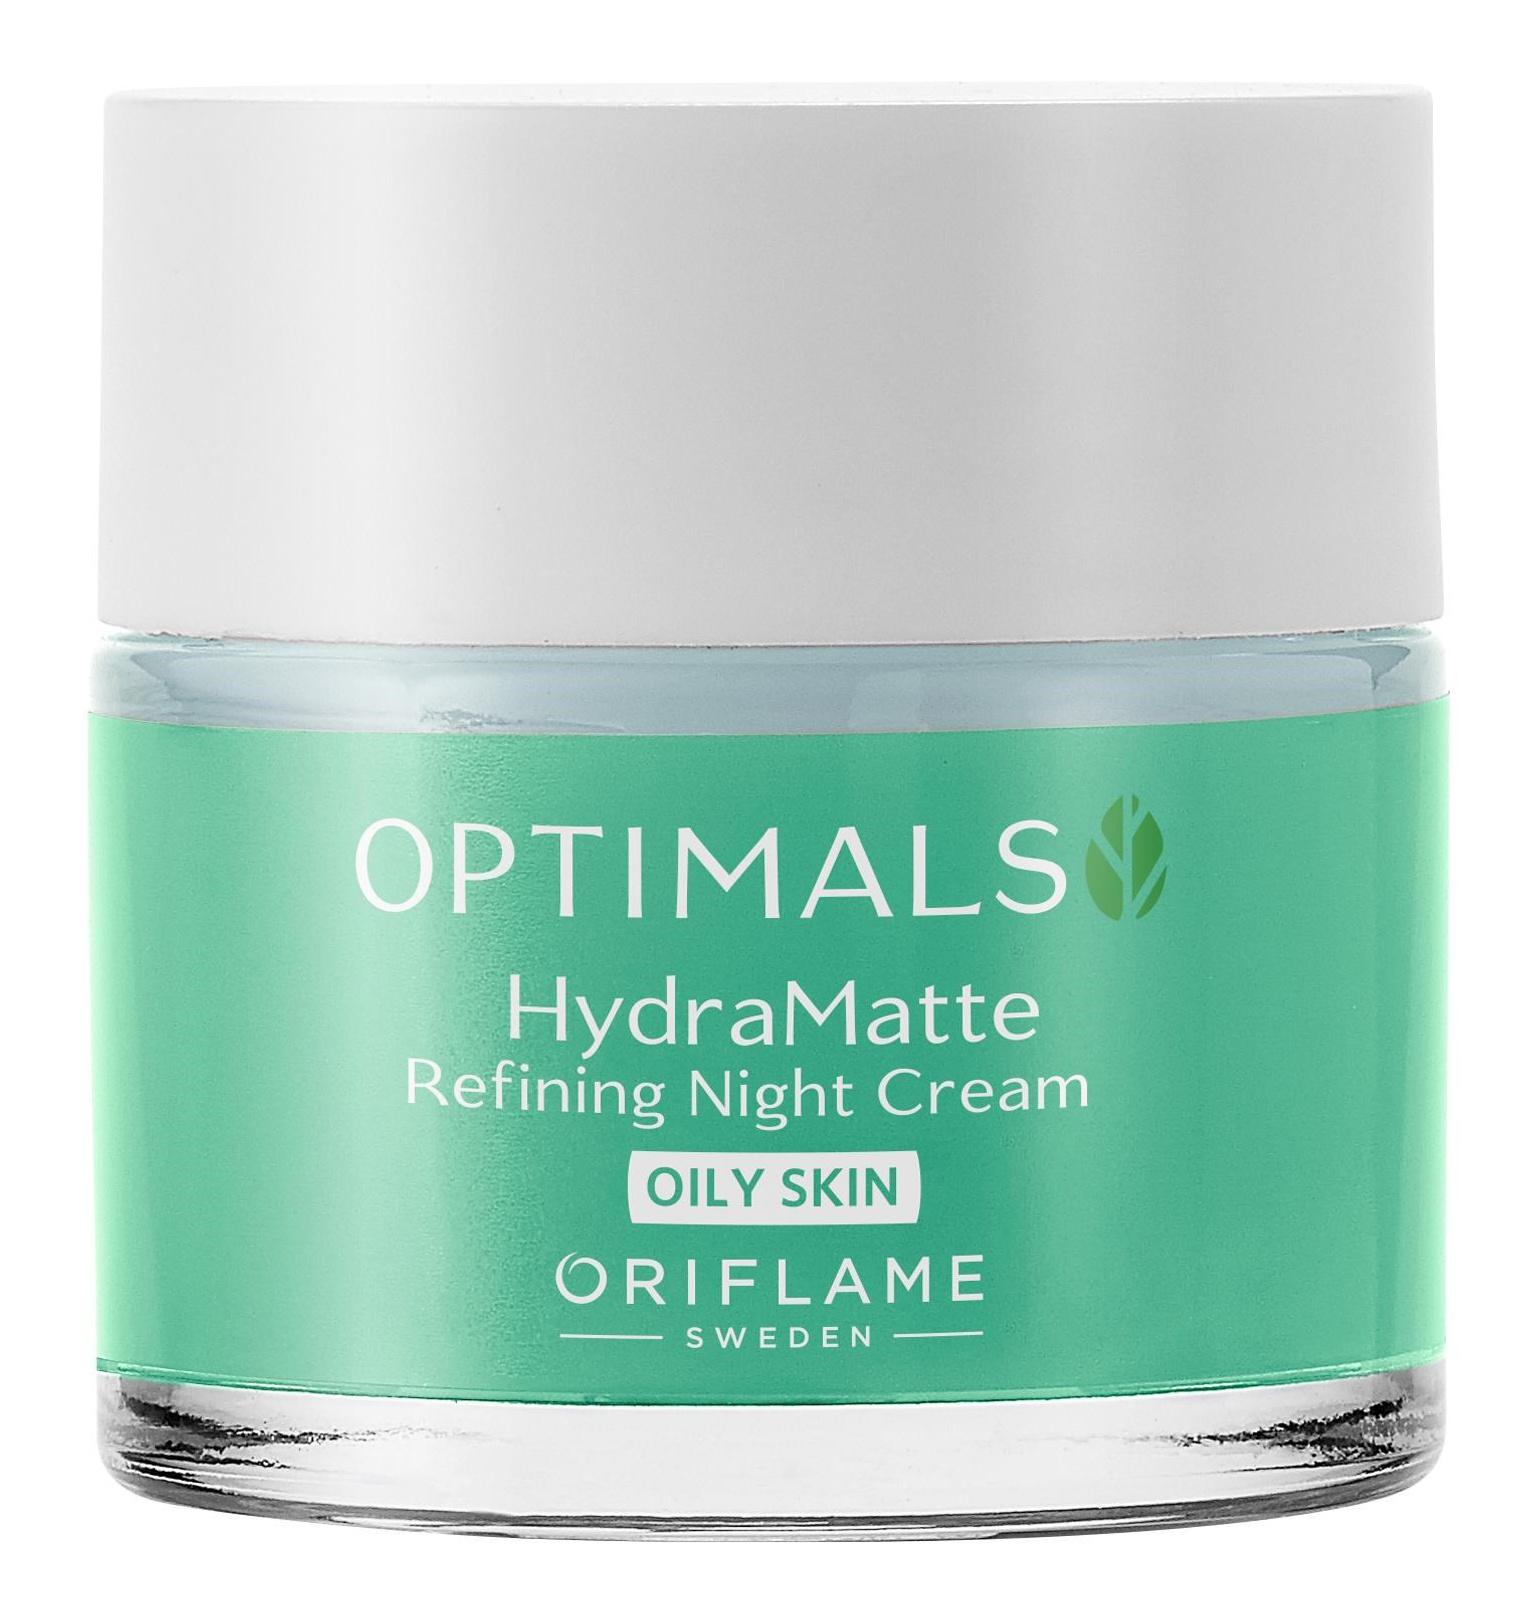 Oriflame Optimals HydraMatte Refining Night Cream